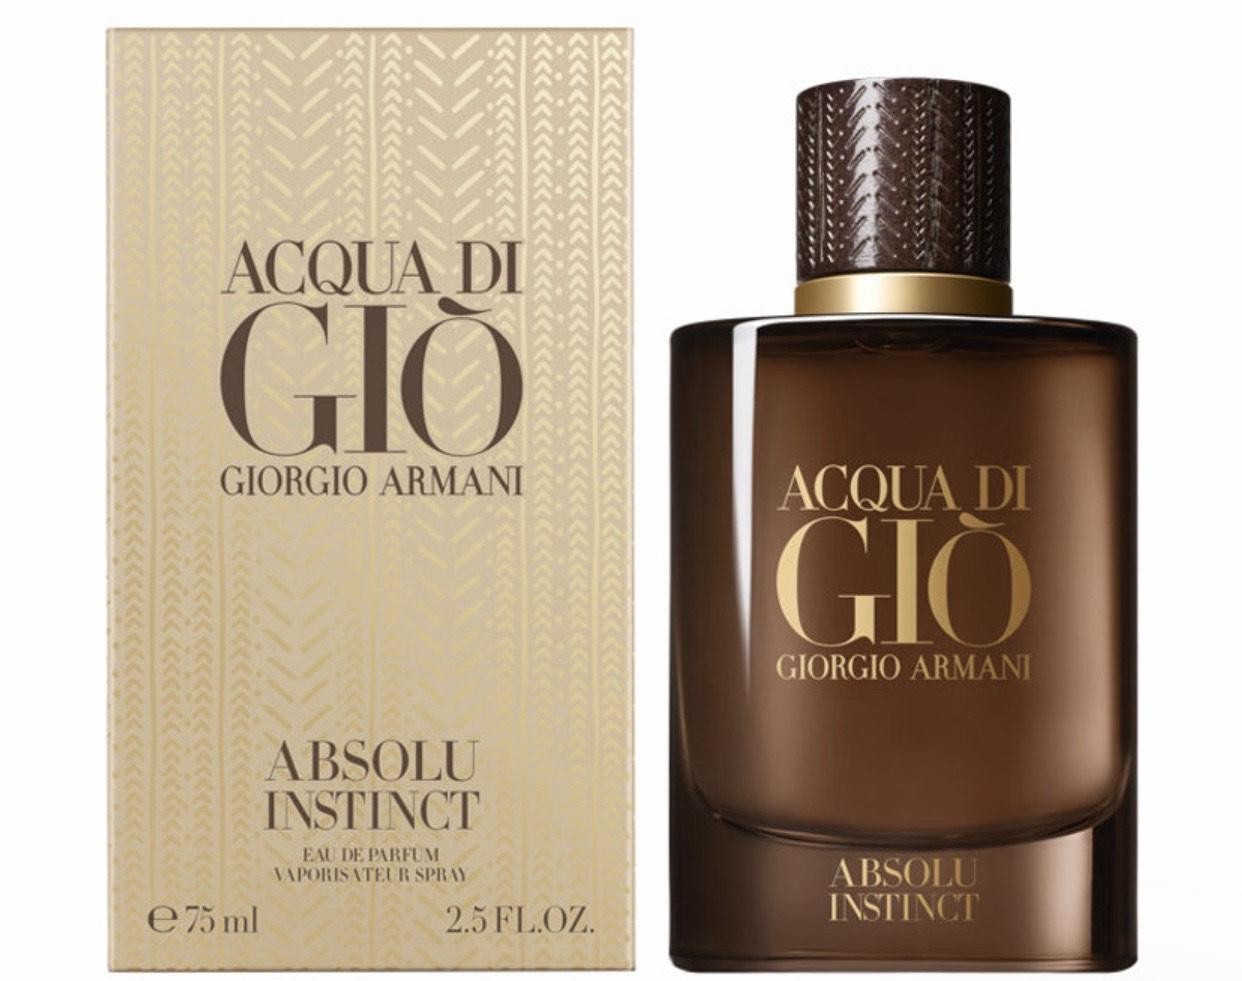 Armani Acqua Di Gio Absolu Instinct Eau De Parfum 75ml Spray £47.97 with code @ Fragrance Shop